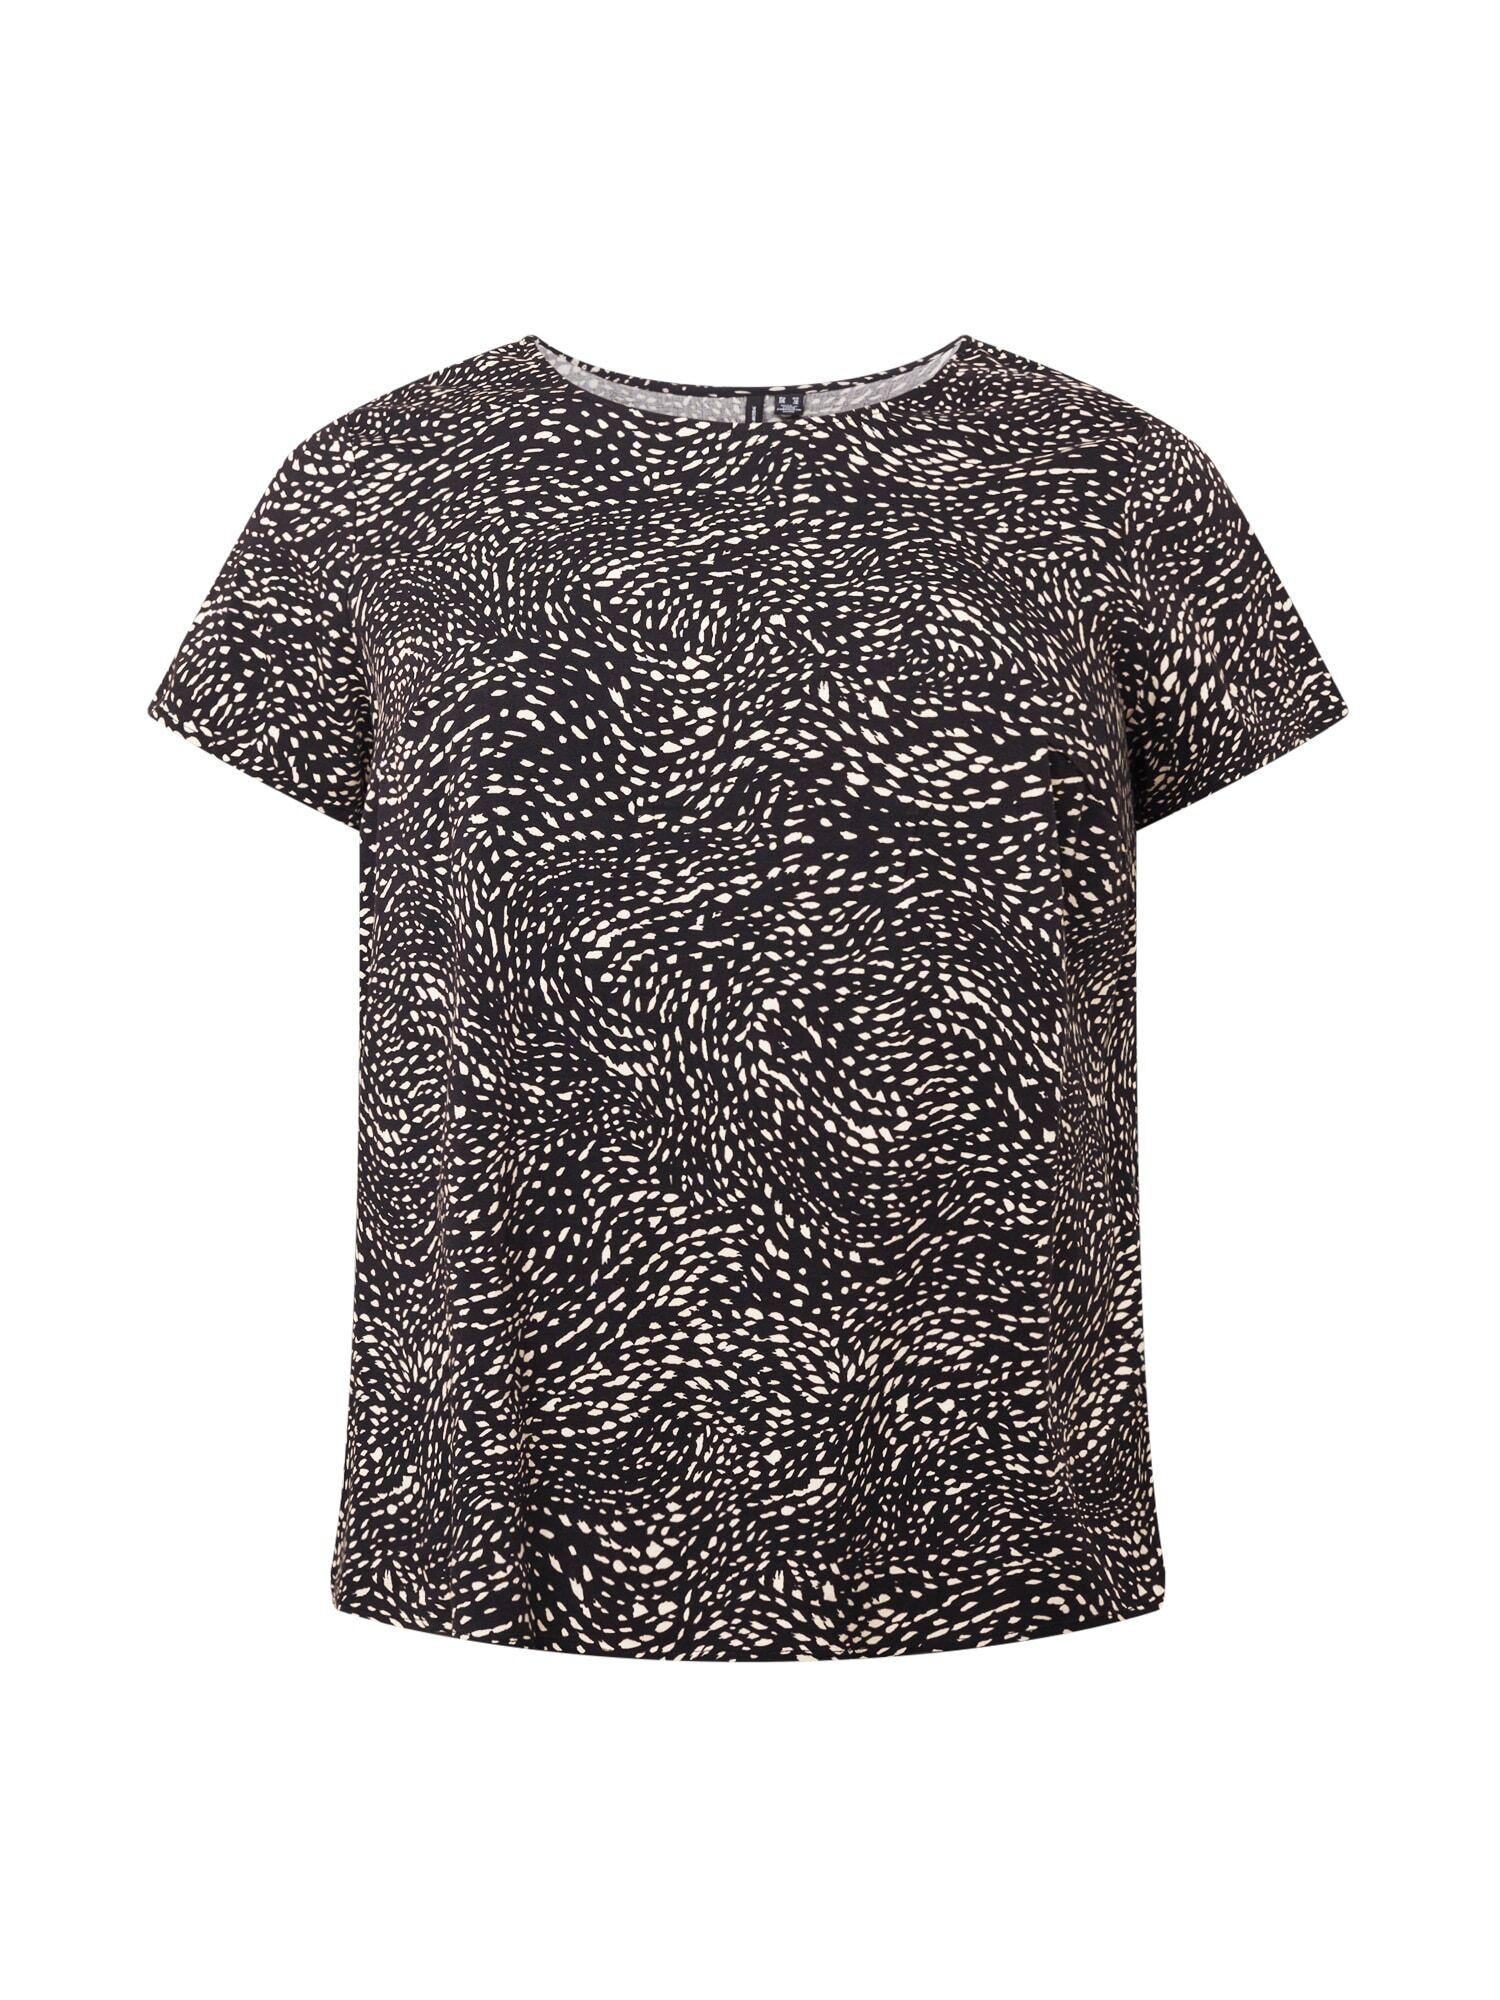 Vero Moda Curve T-shirt 'BACA'  - Noir - Taille: 54 - female